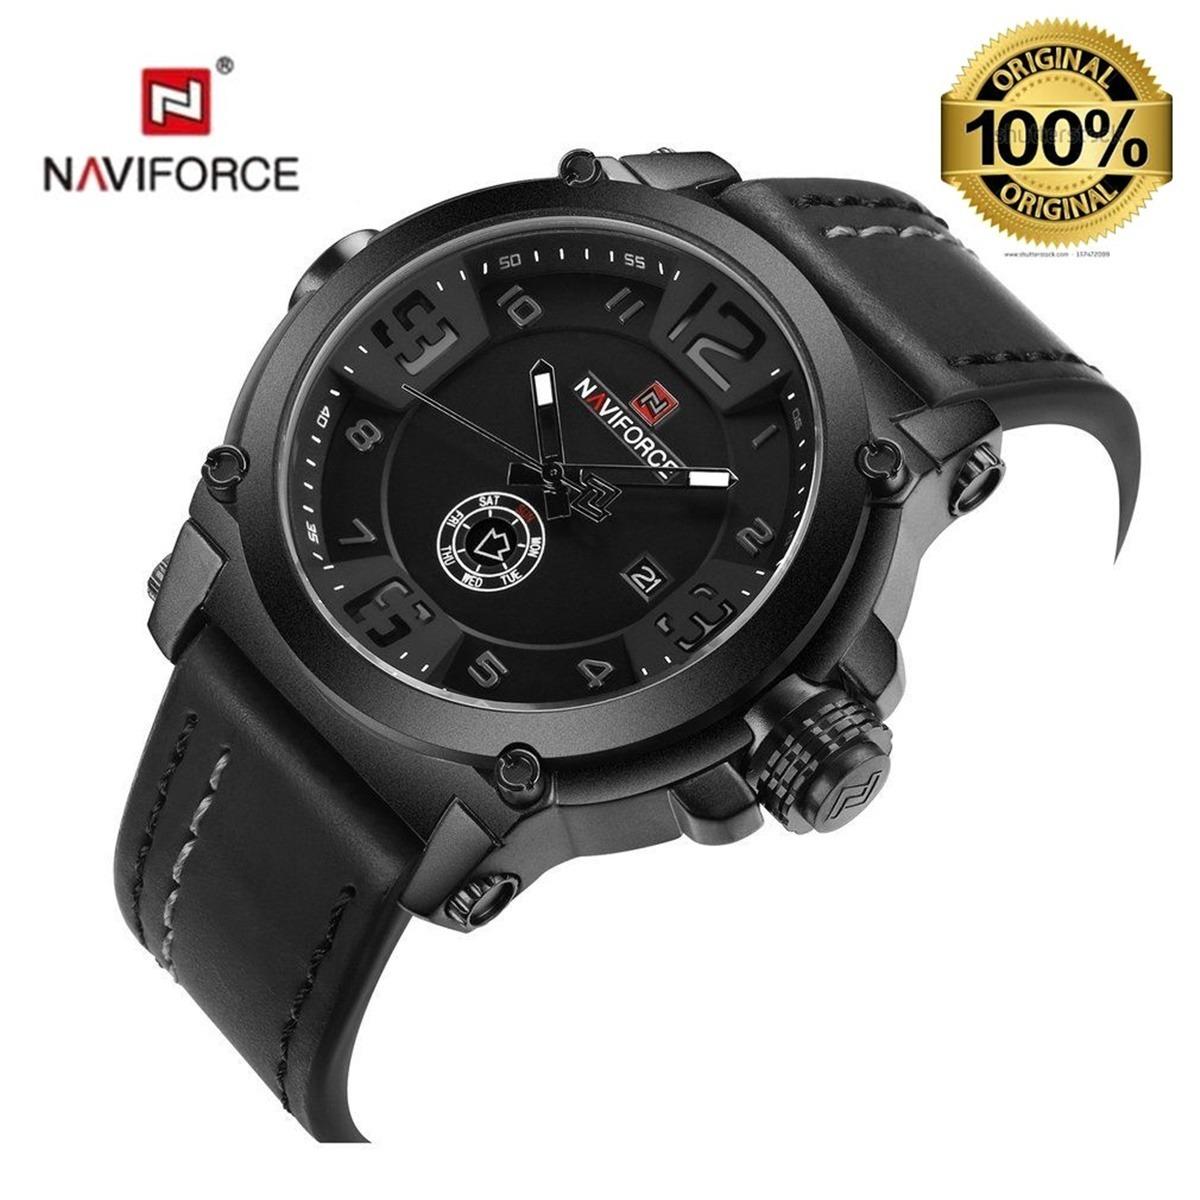 e3bb6e01381 Relógio De Pulso Masc Naviforce 9099 Pb Nota Fiscal +brinde - R  123 ...